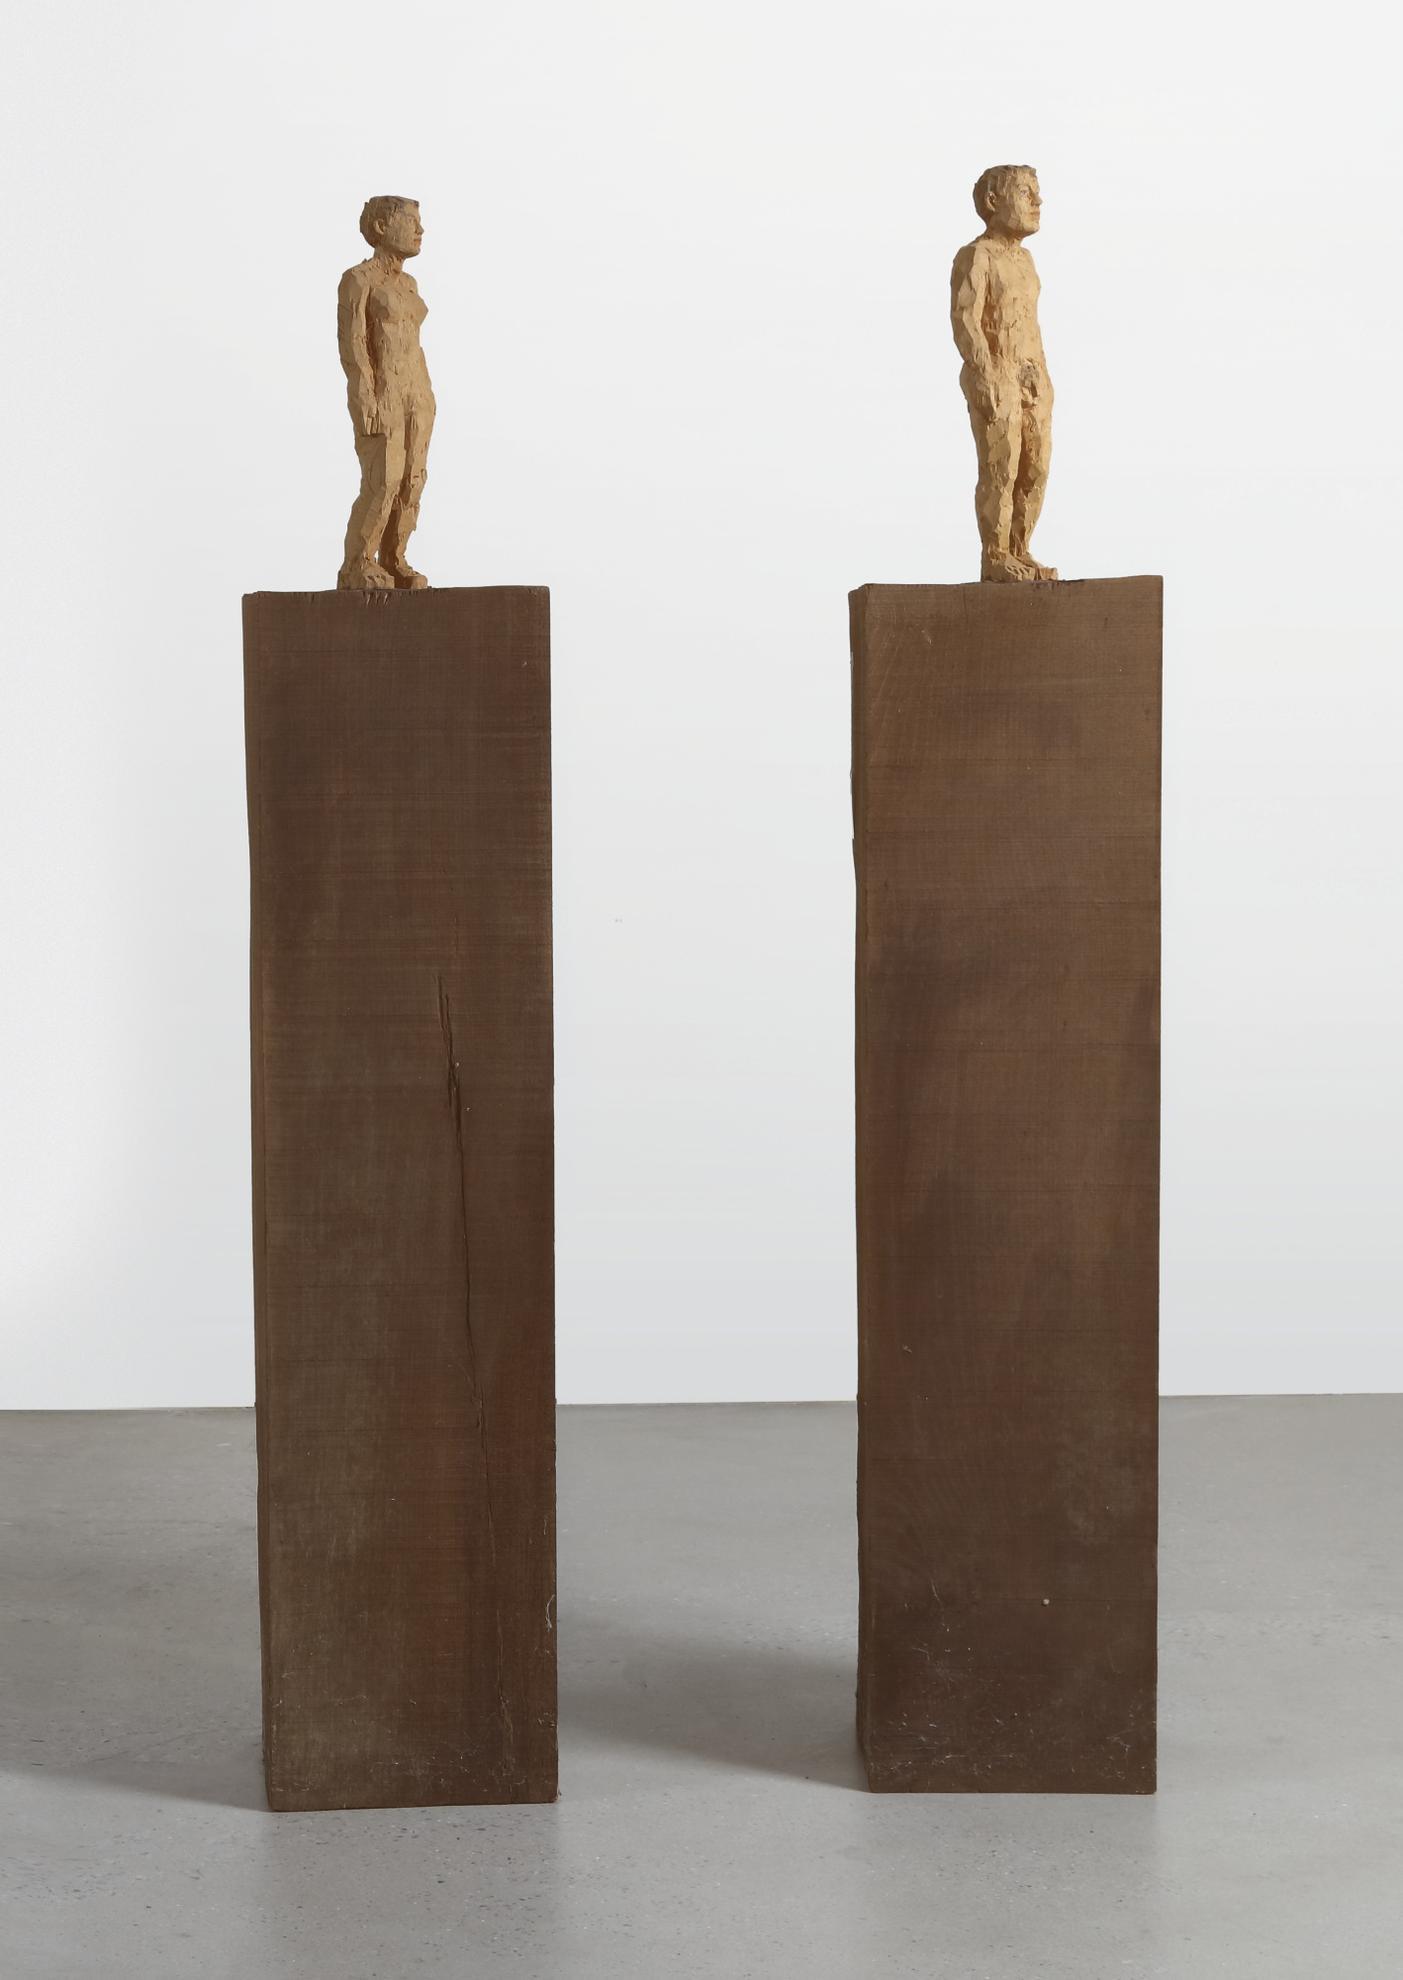 Stephen Balkenhol - Man And Woman-1990